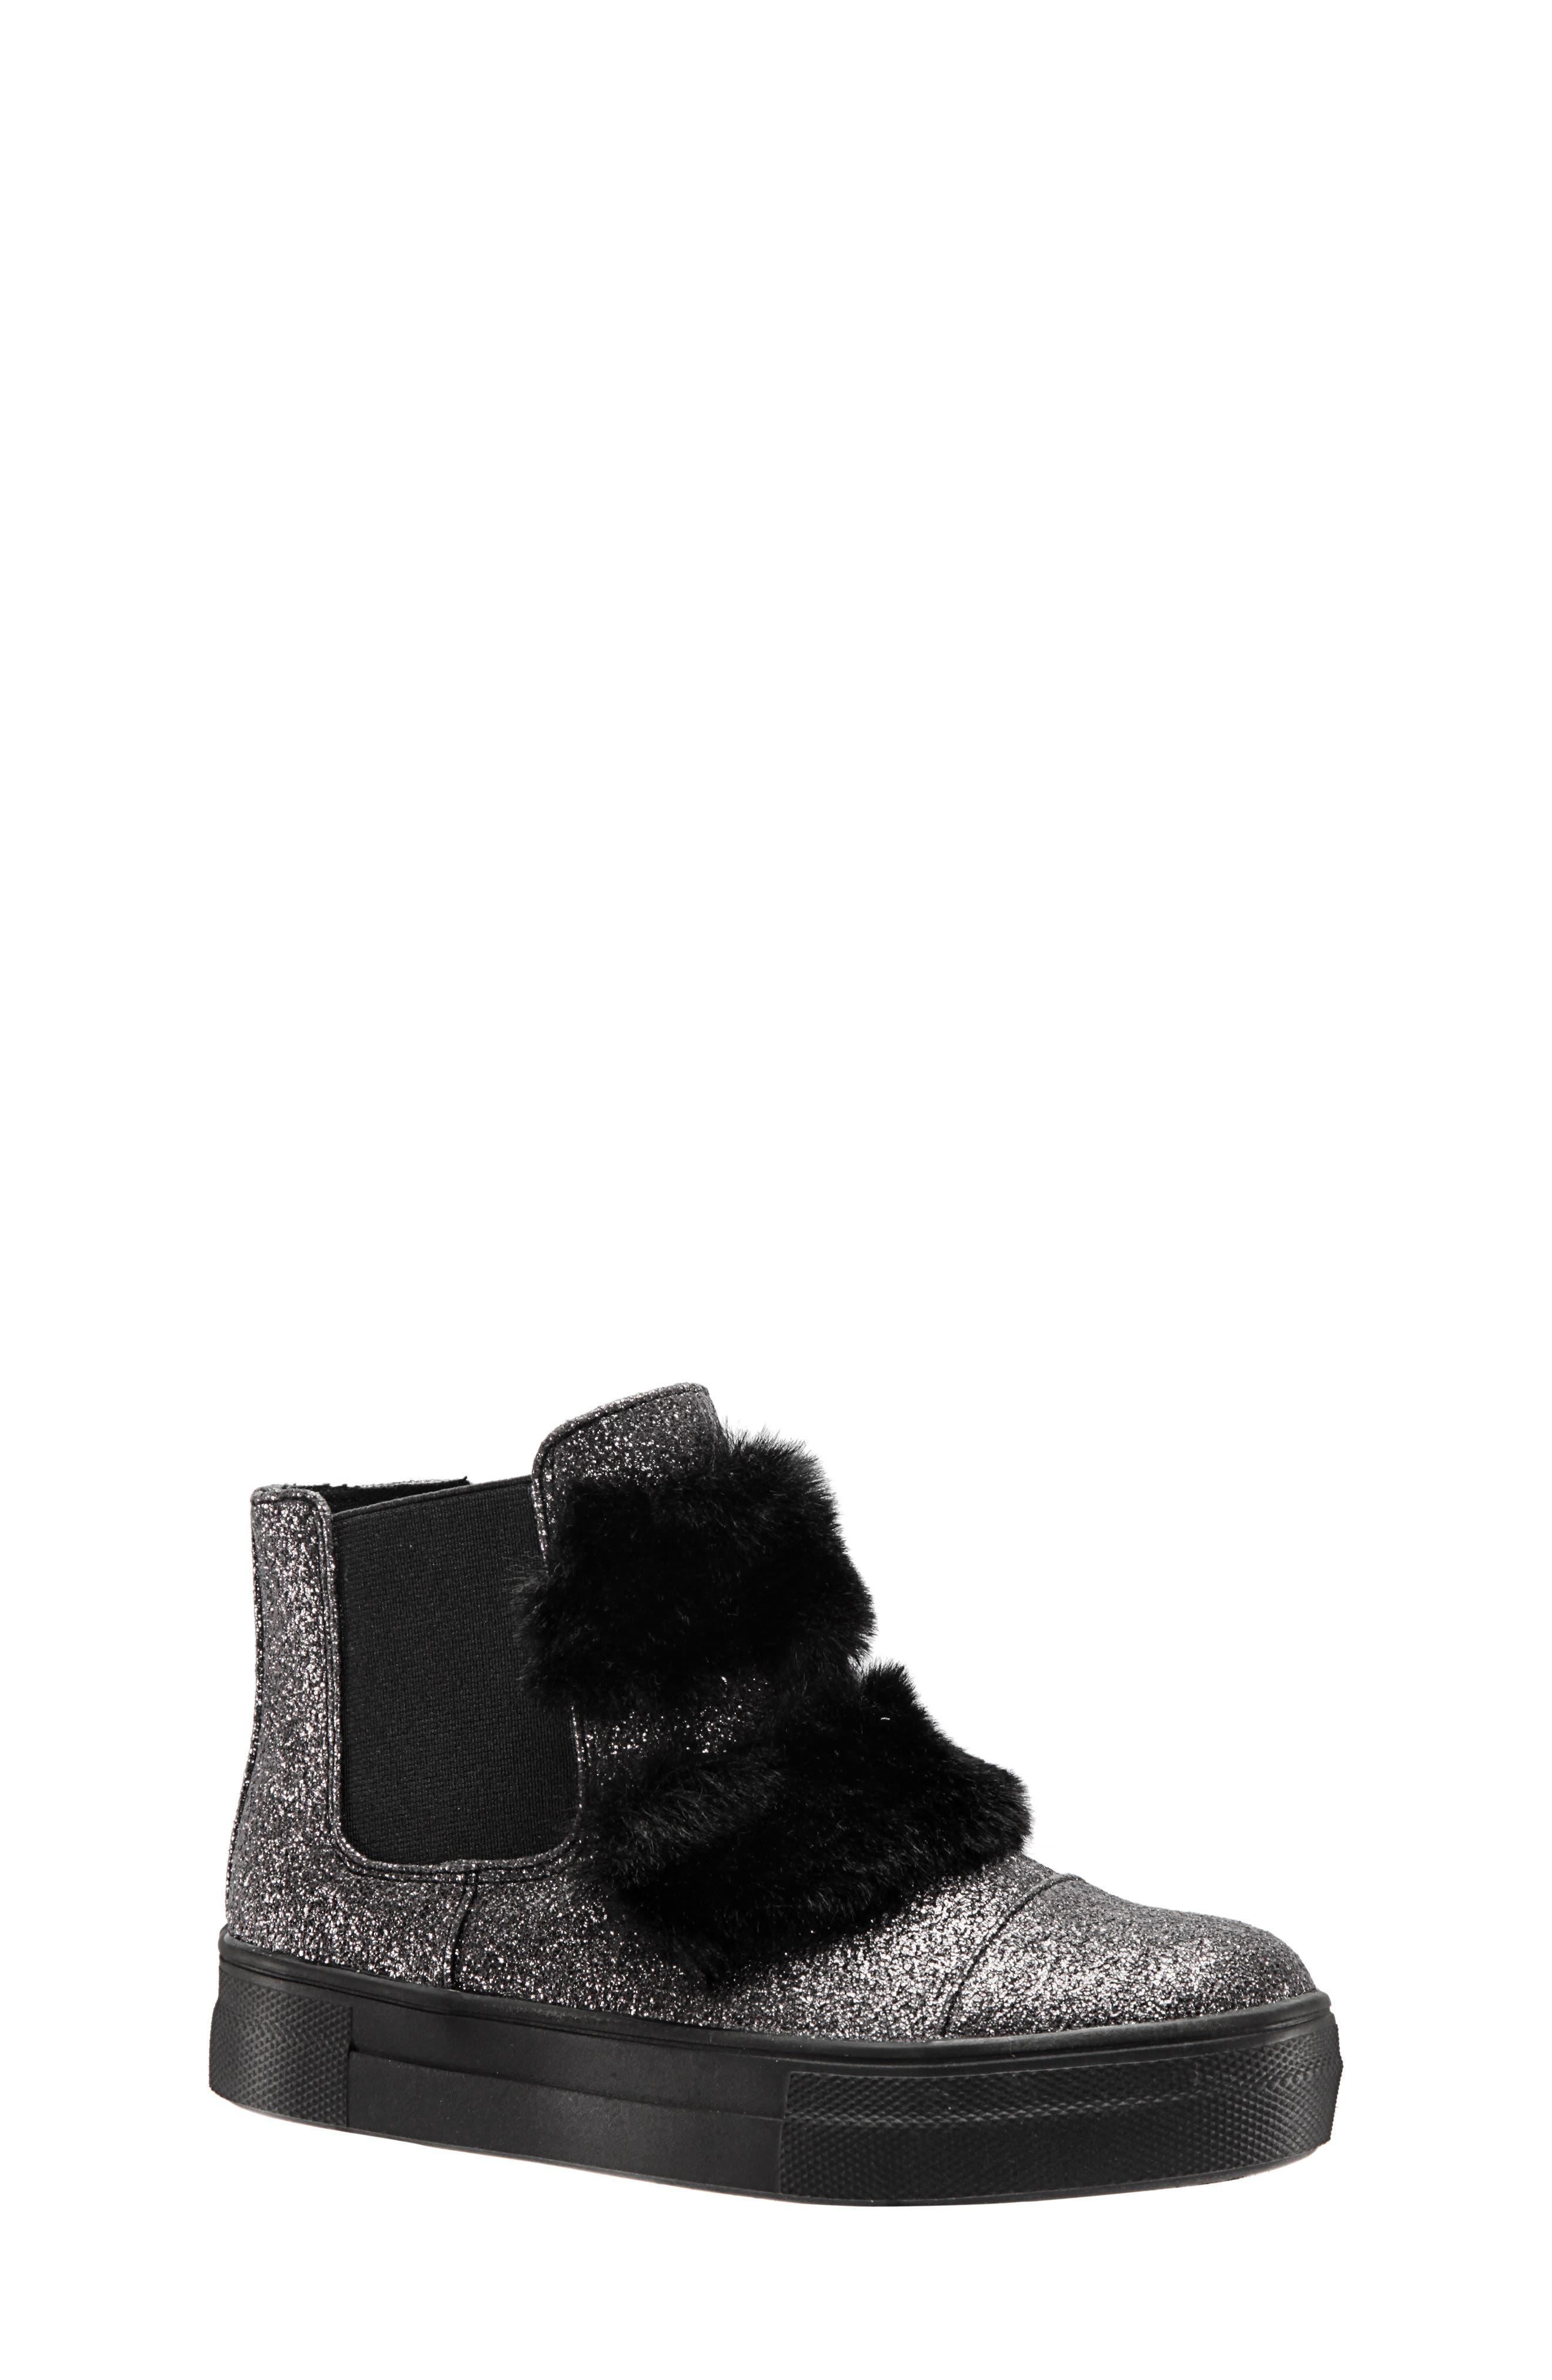 Helen Faux Fur Bootie Sneaker,                             Main thumbnail 1, color,                             PEWTER CRACKLE METALLIC